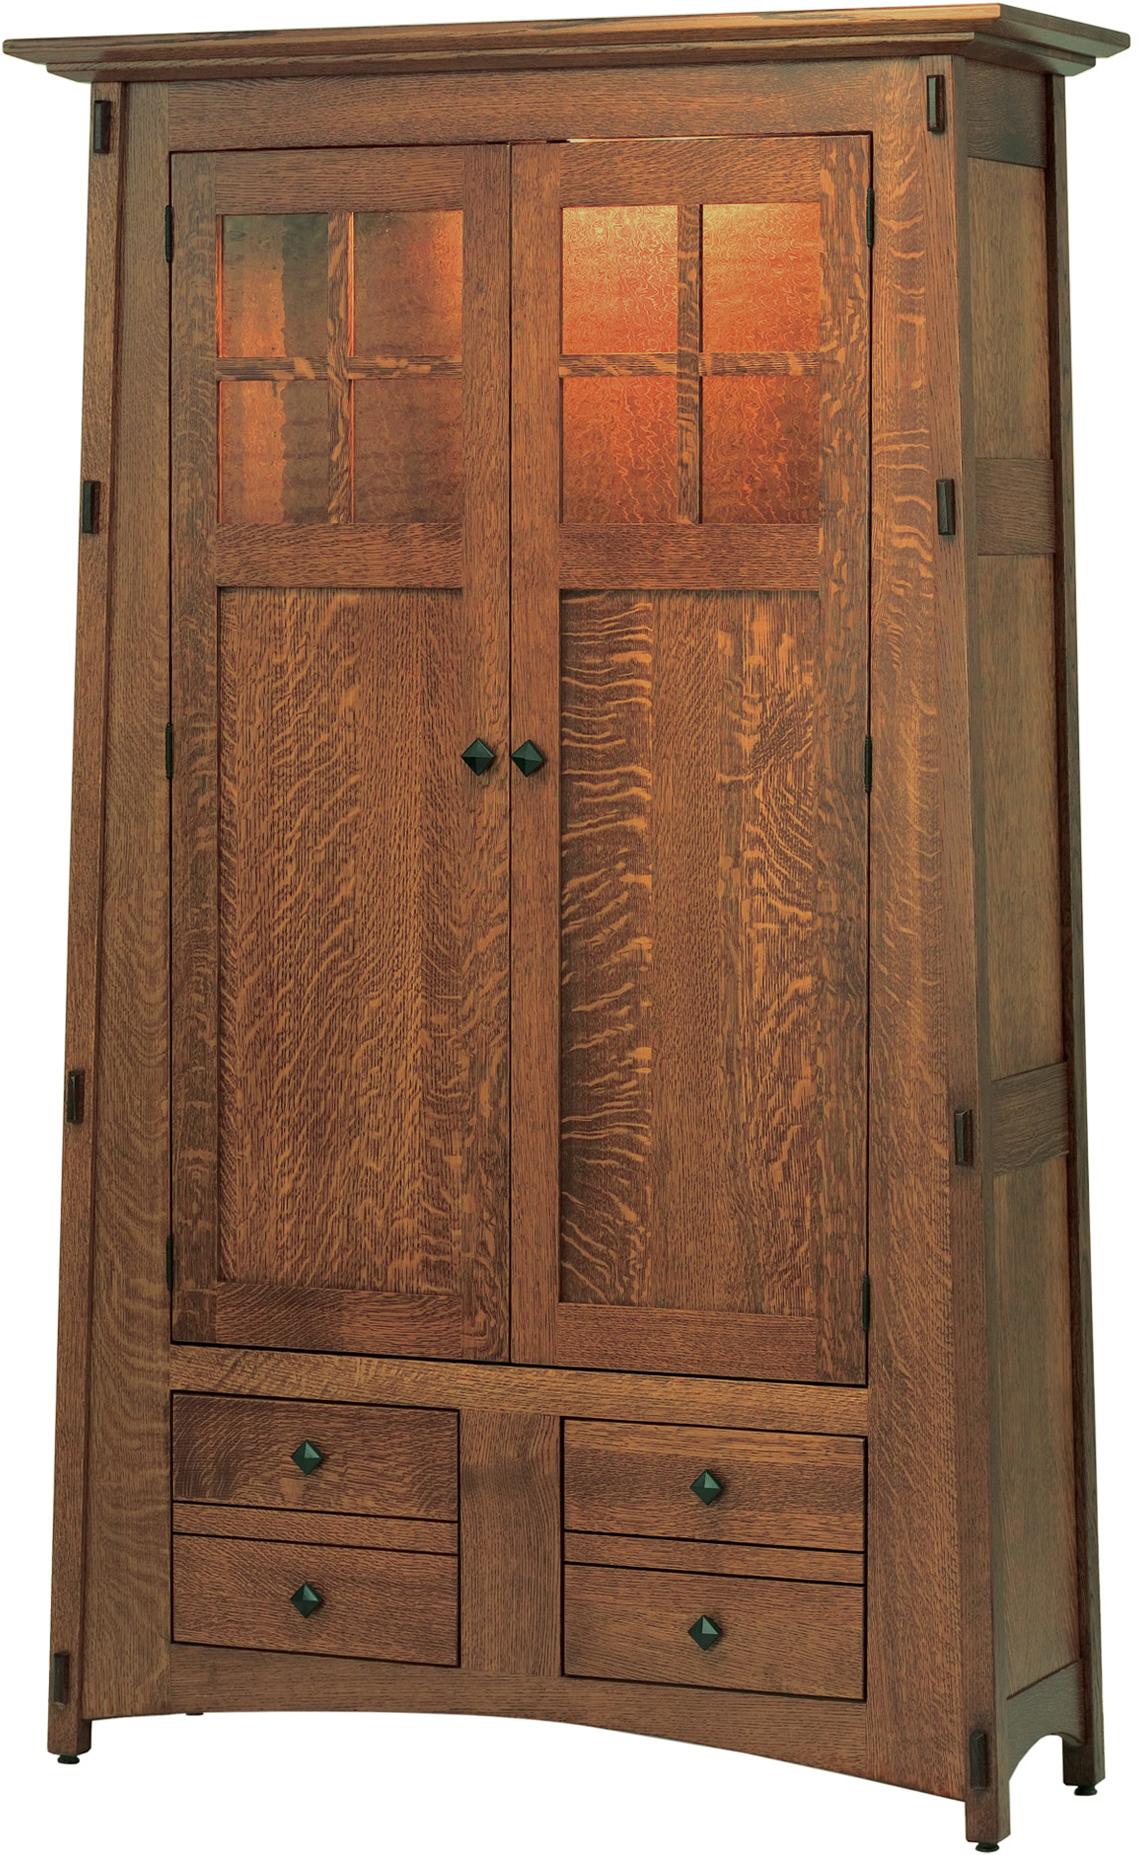 Amish Mccoy Amber Glass Bookcase